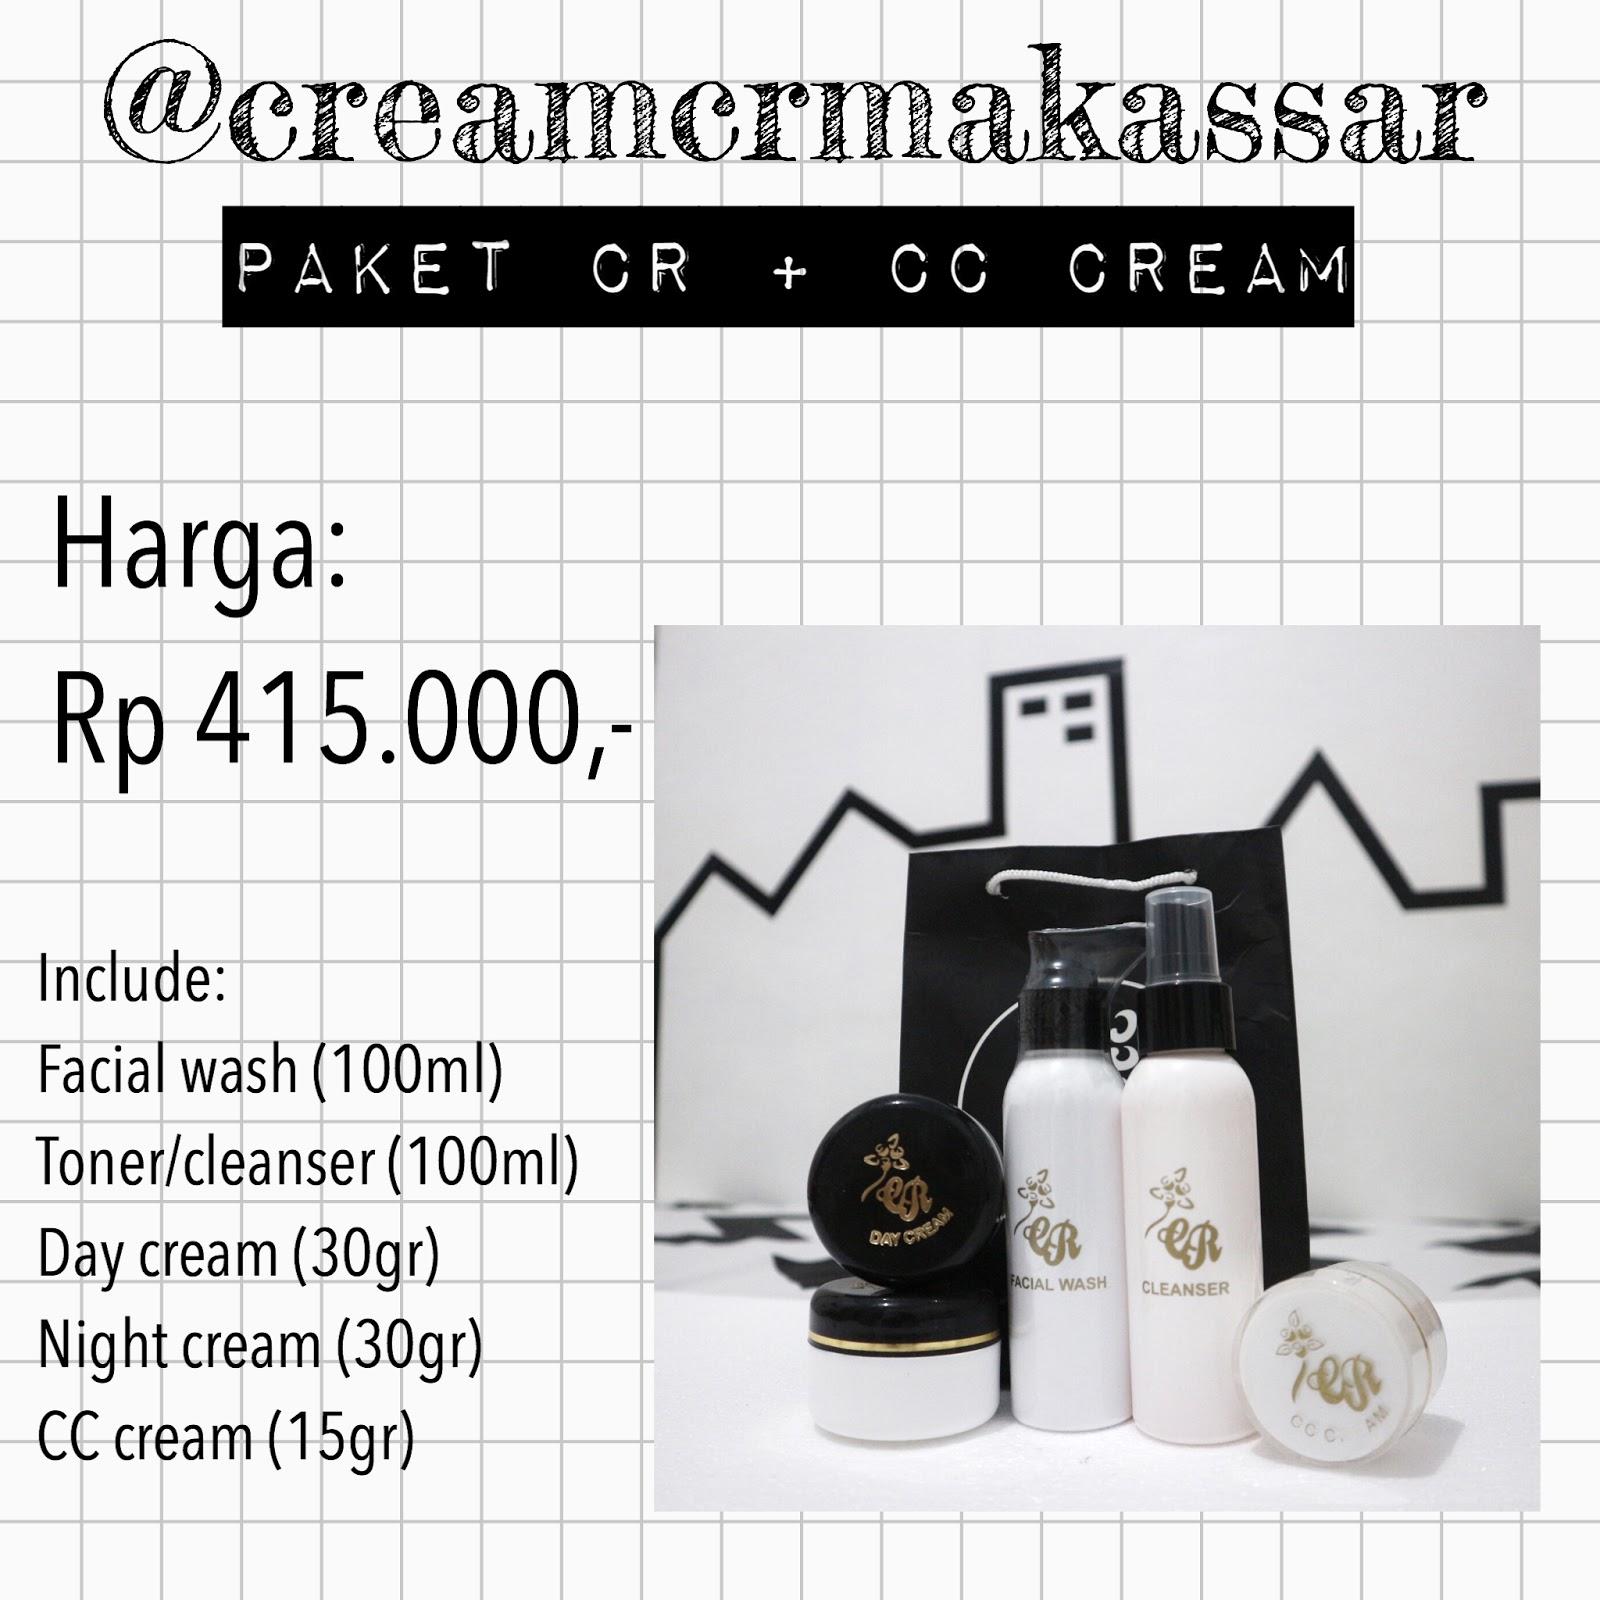 Cream Cr Makassar Kemasan Biru Crem Daftar Harga Di Creamcrmakassar